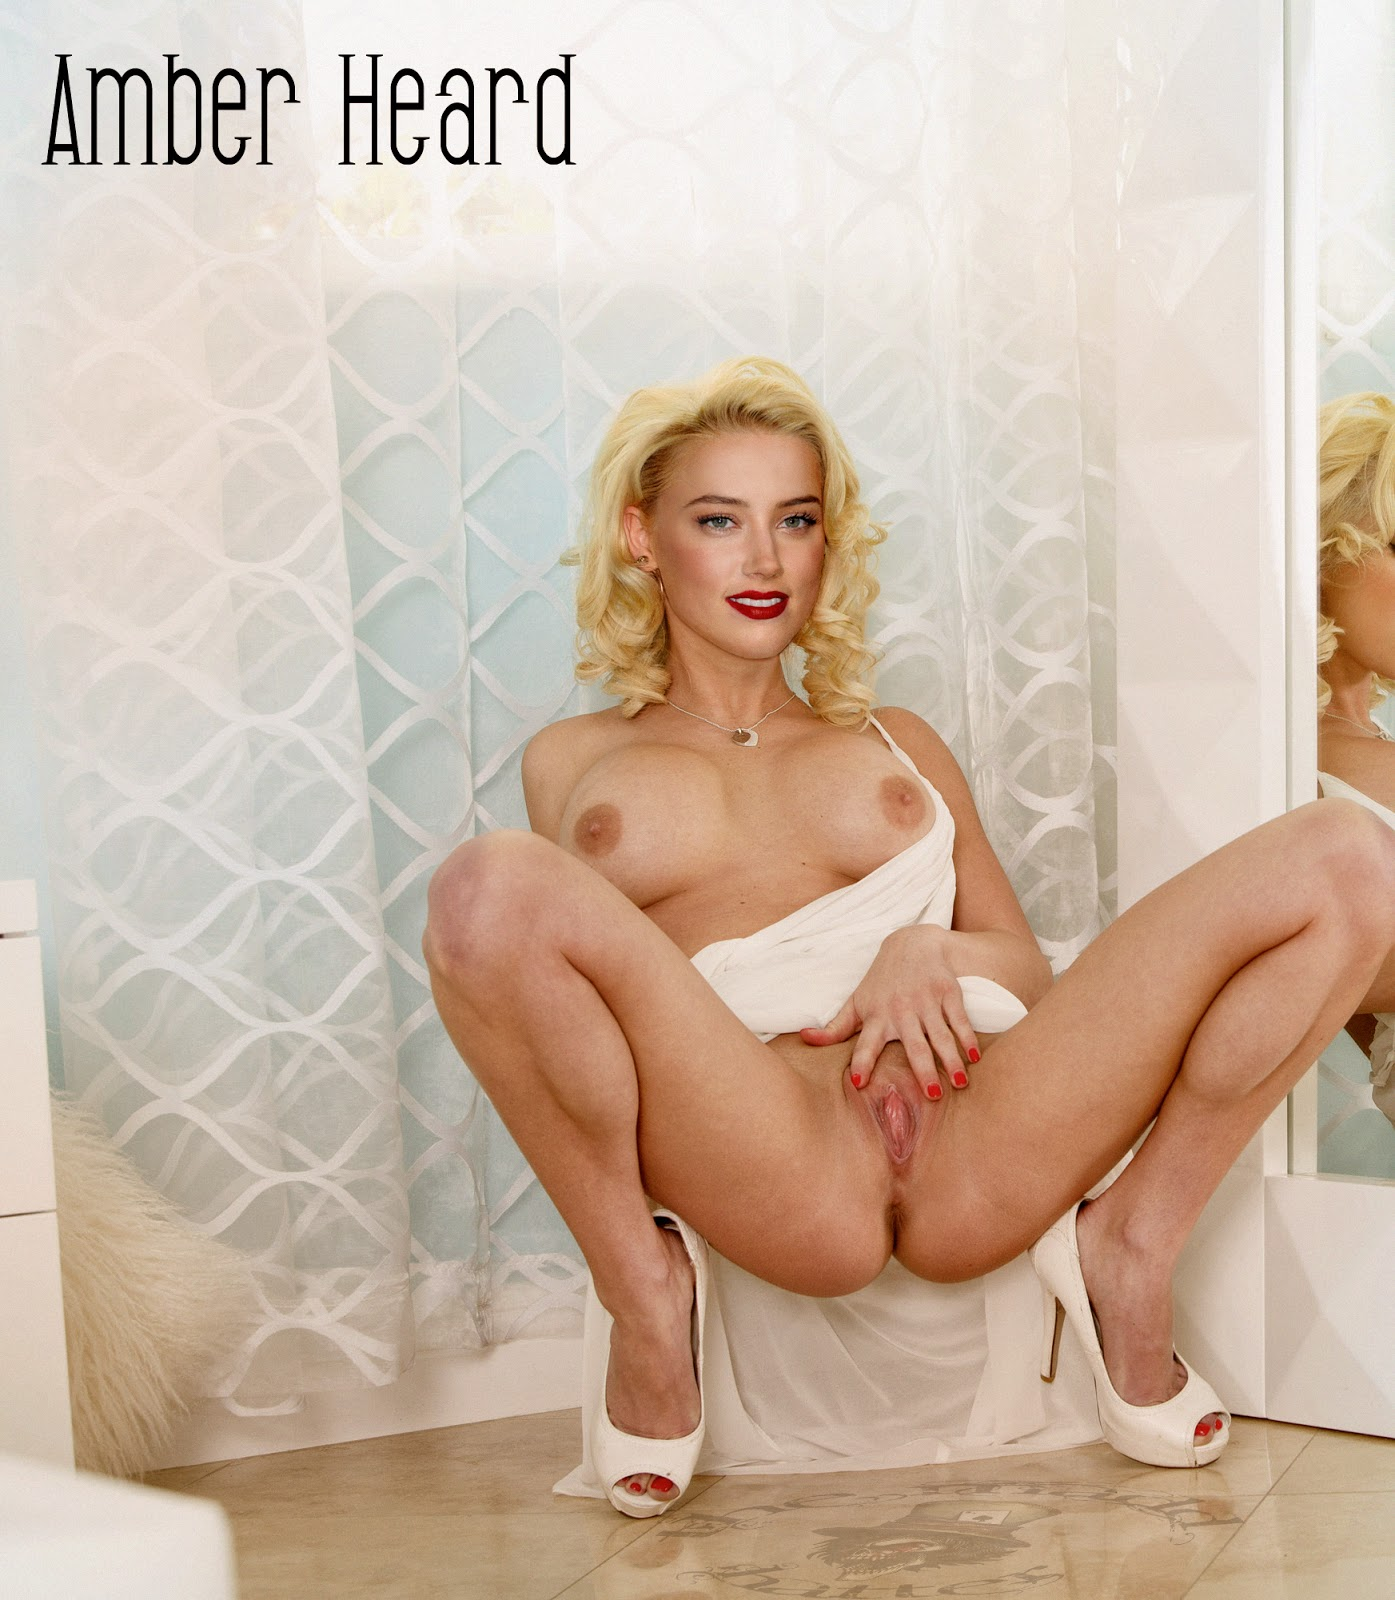 amber-heard-nude-getting-fuccked-bangbros-ass-videos